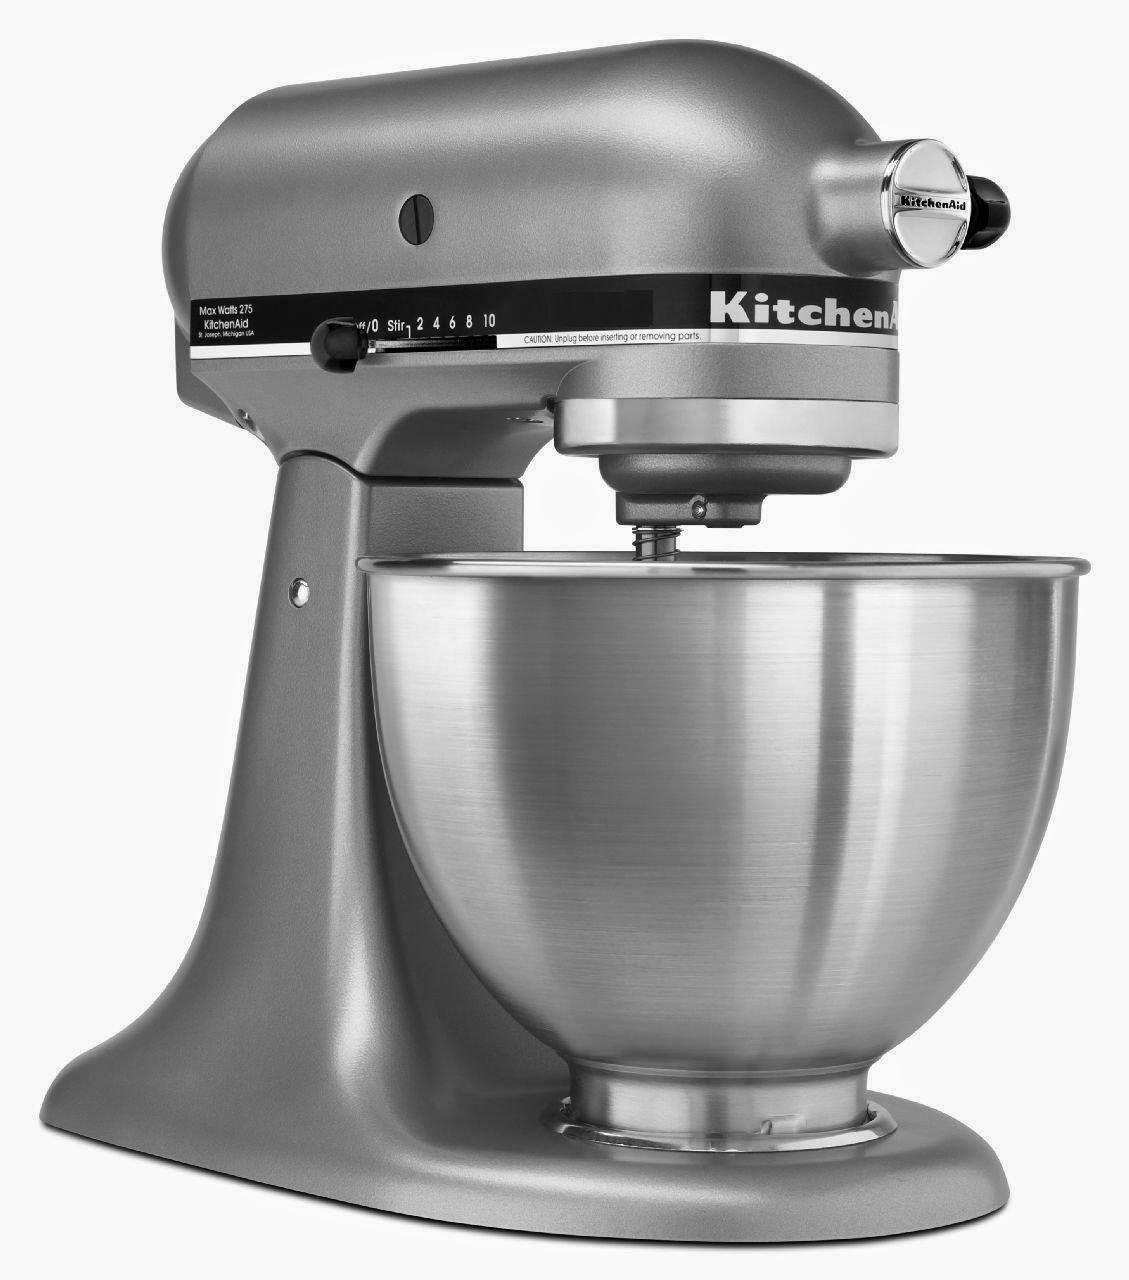 Home, Garden & More...: KitchenAid K45SSWH K45SS Classic 4.5 Quart ...